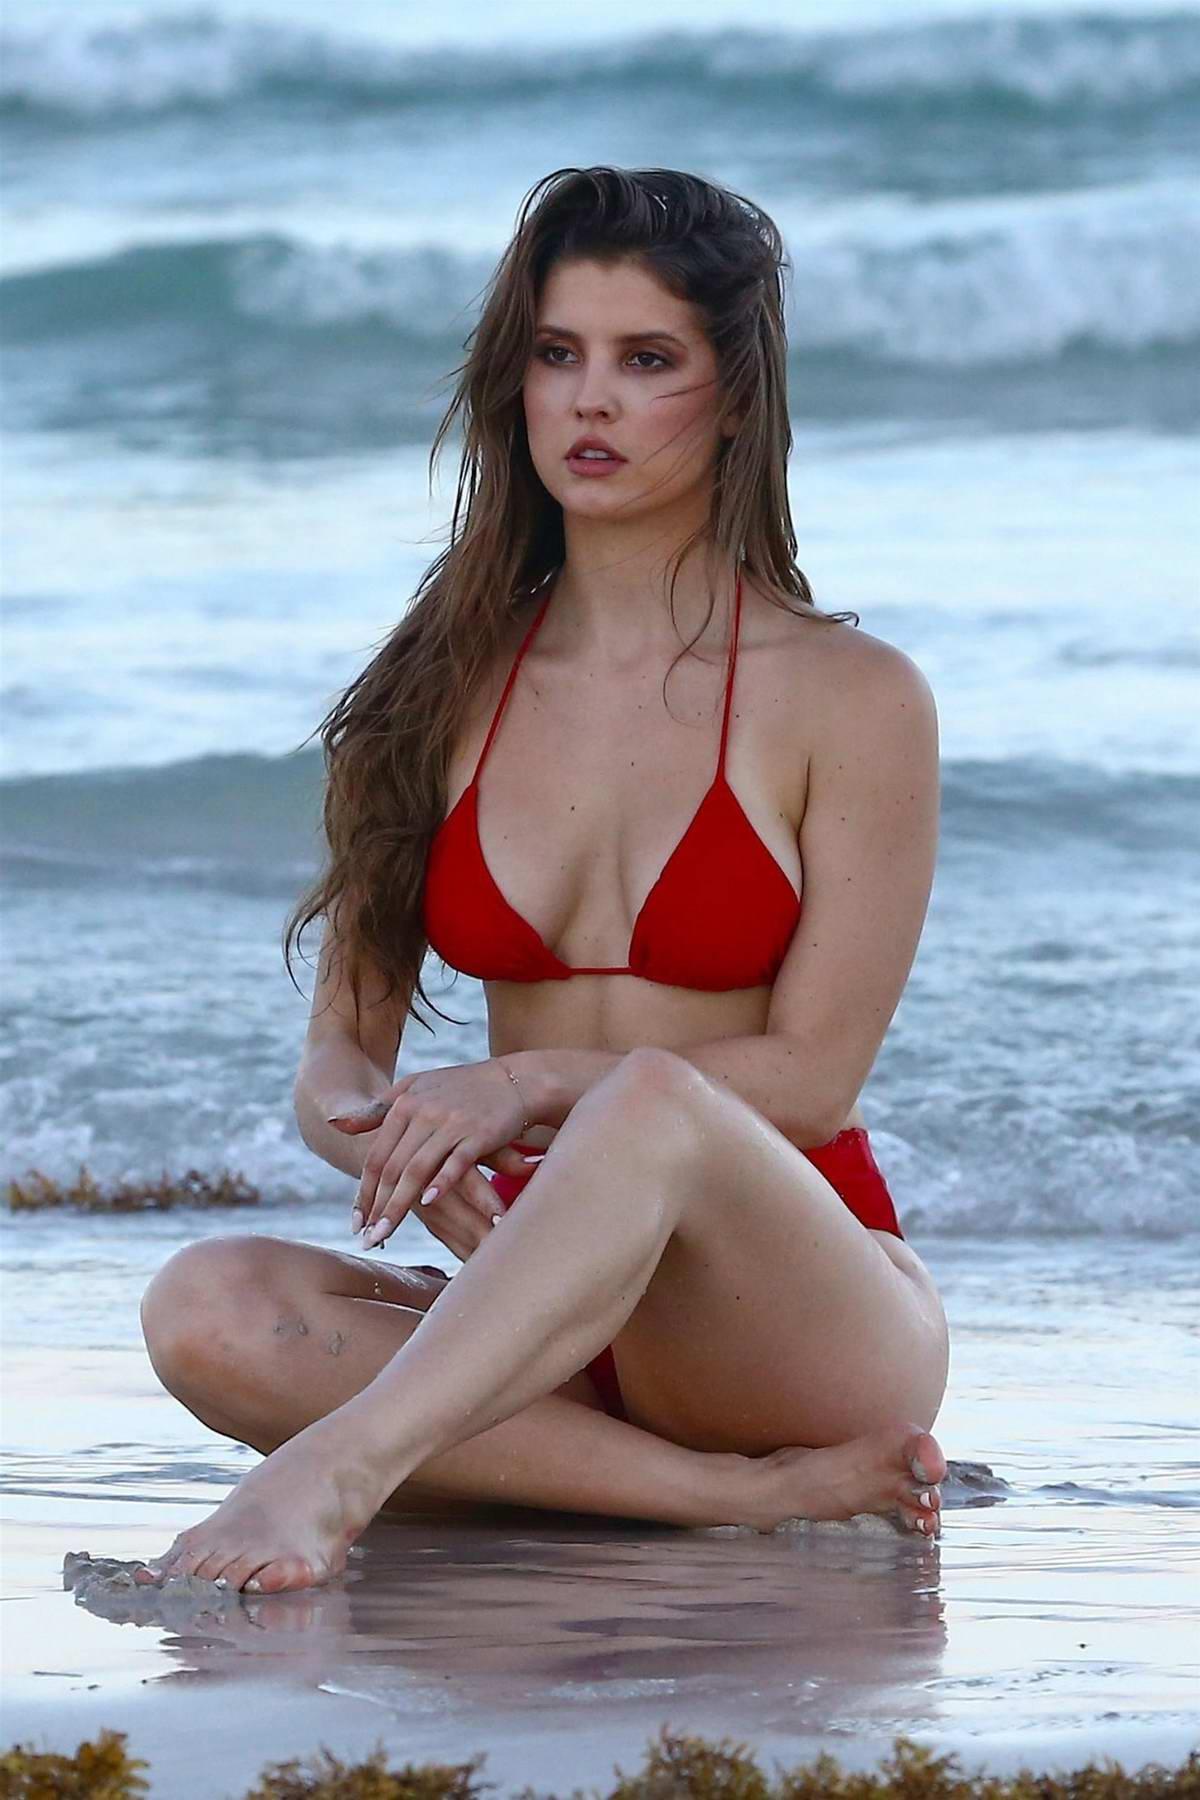 Amanda Cerny in a Red Bikini on a Photoshoot in Miami